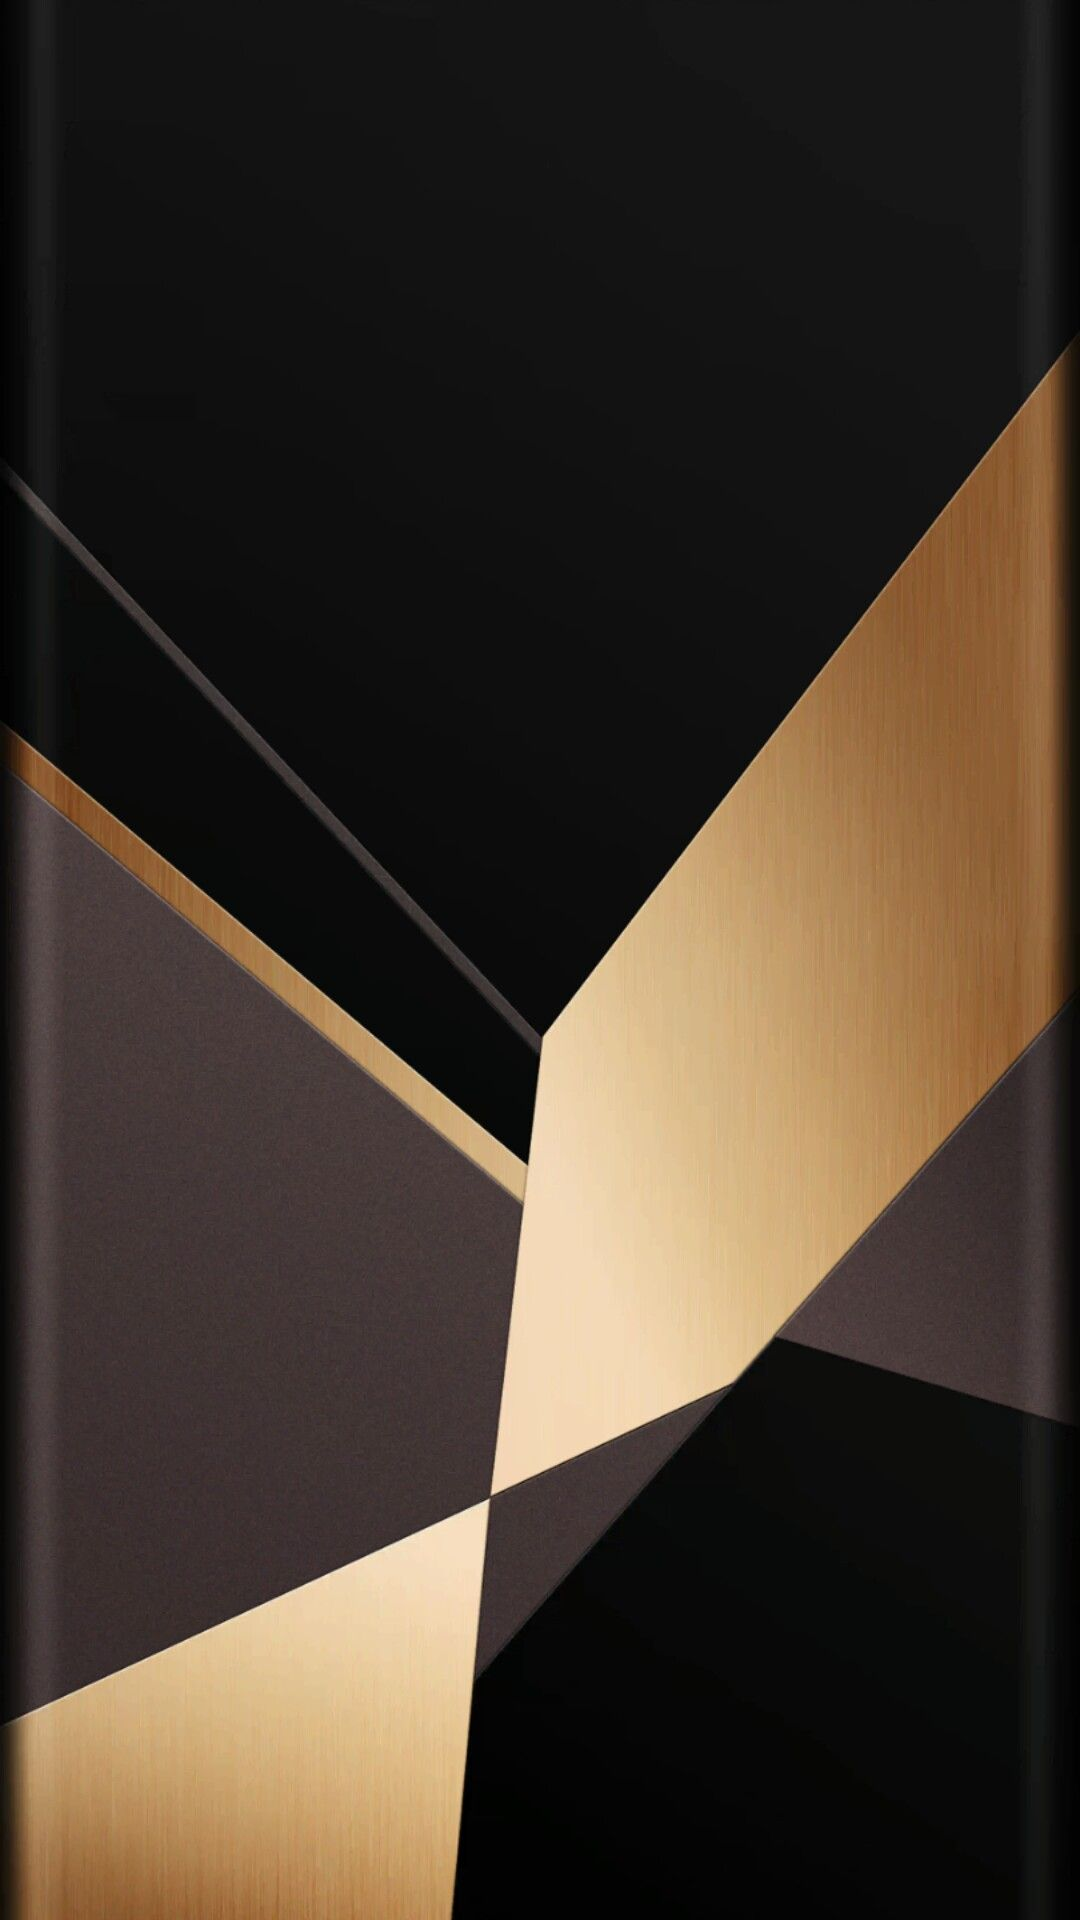 Samsung Iphone Edge Phonetelefon 3d Wallpaper Latar Belakang Gambar Wallpaper Ponsel